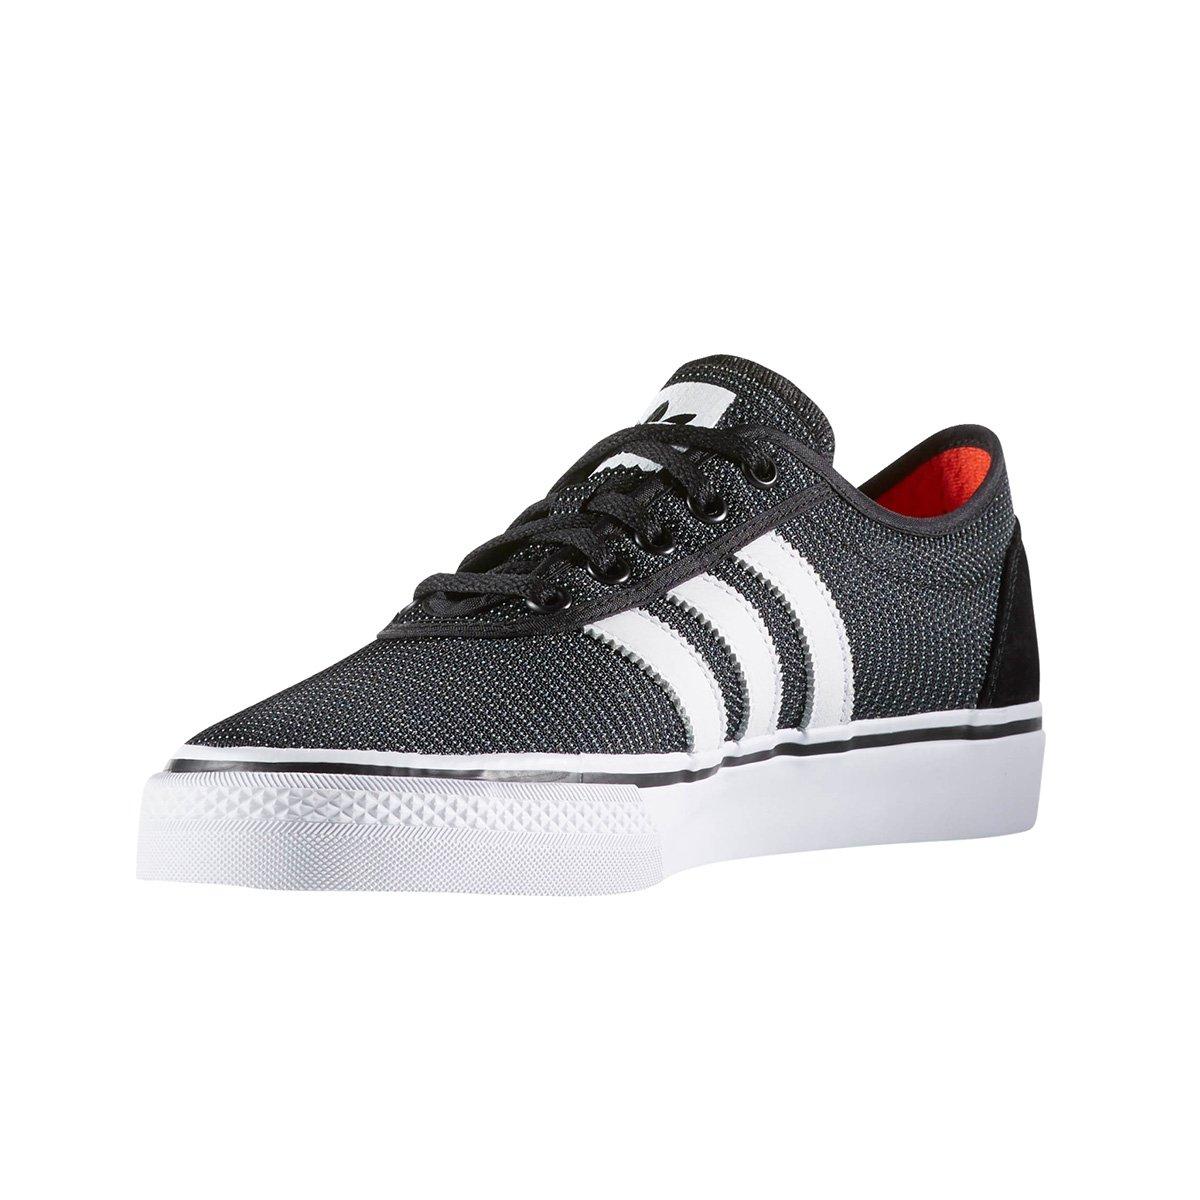 new products 770d9 81a64 Adidas Adi-Ease BY4034 y BB8471,Skateboarding.Basket. Sneaker (44 EU,  CblackFtwwhtEnergy) Amazon.fr Chaussures et Sacs